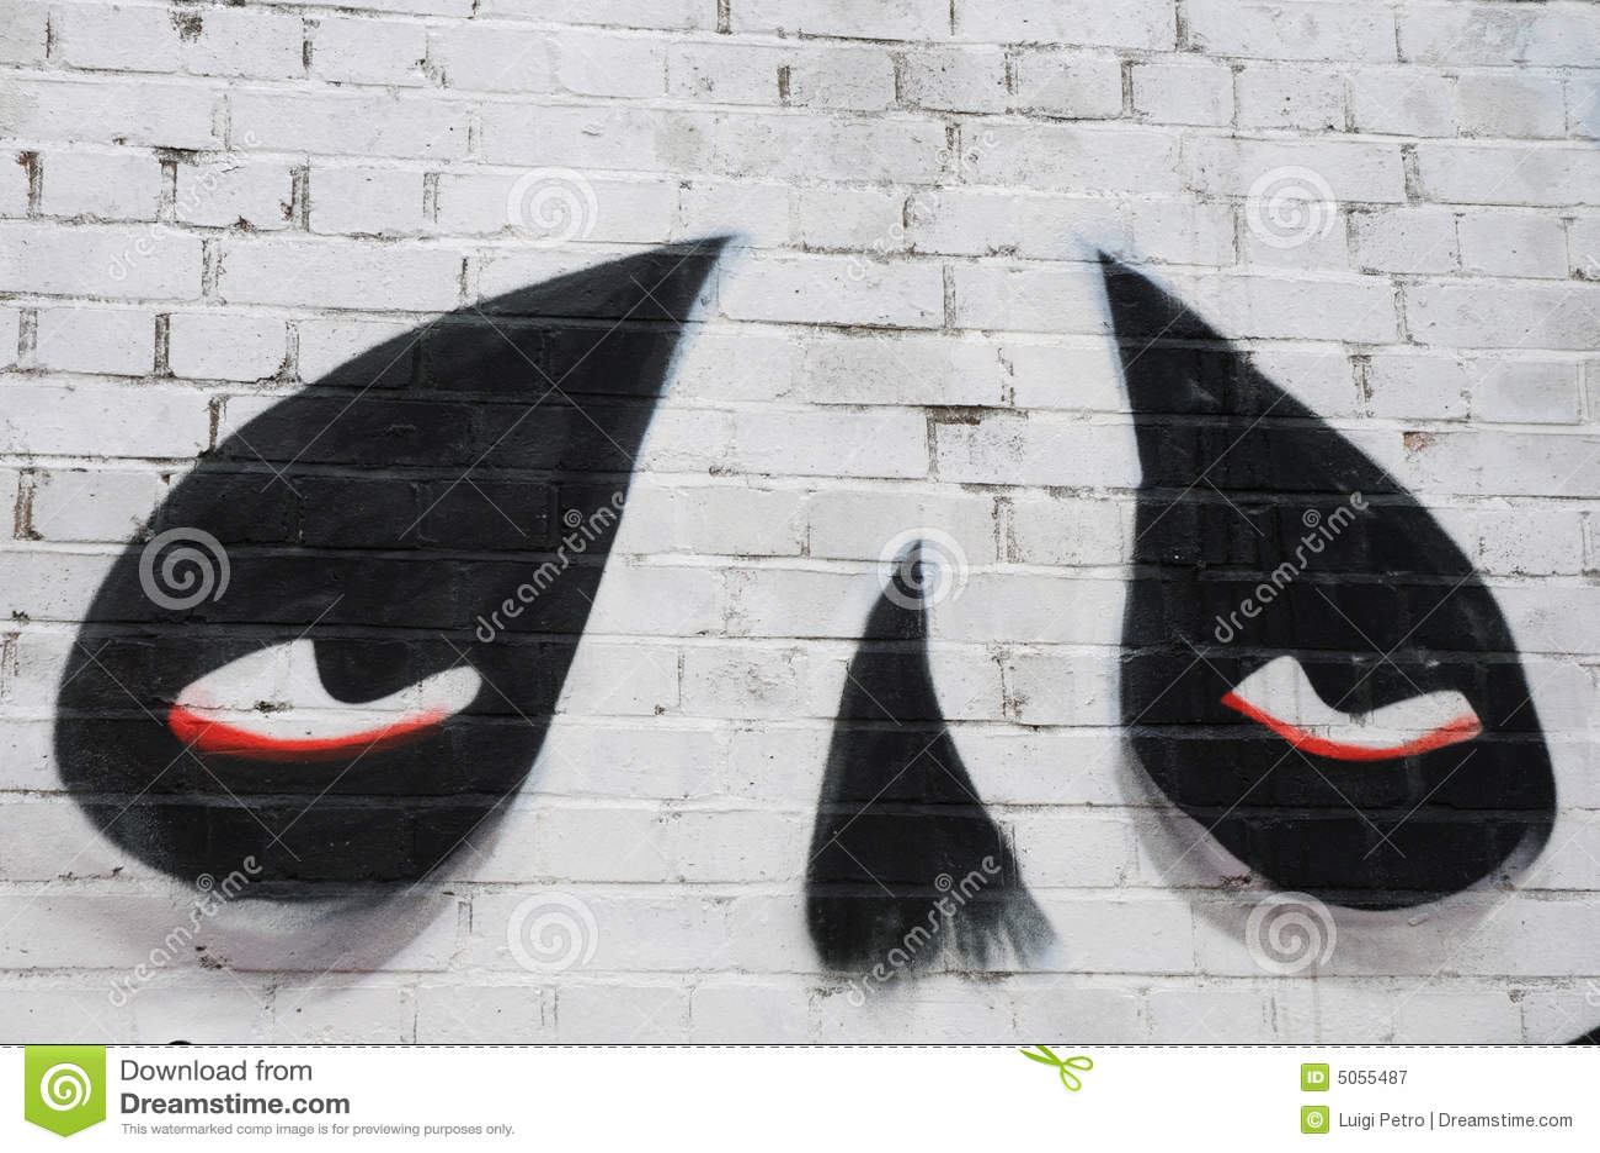 Graffiti in via di Sclater, Londra